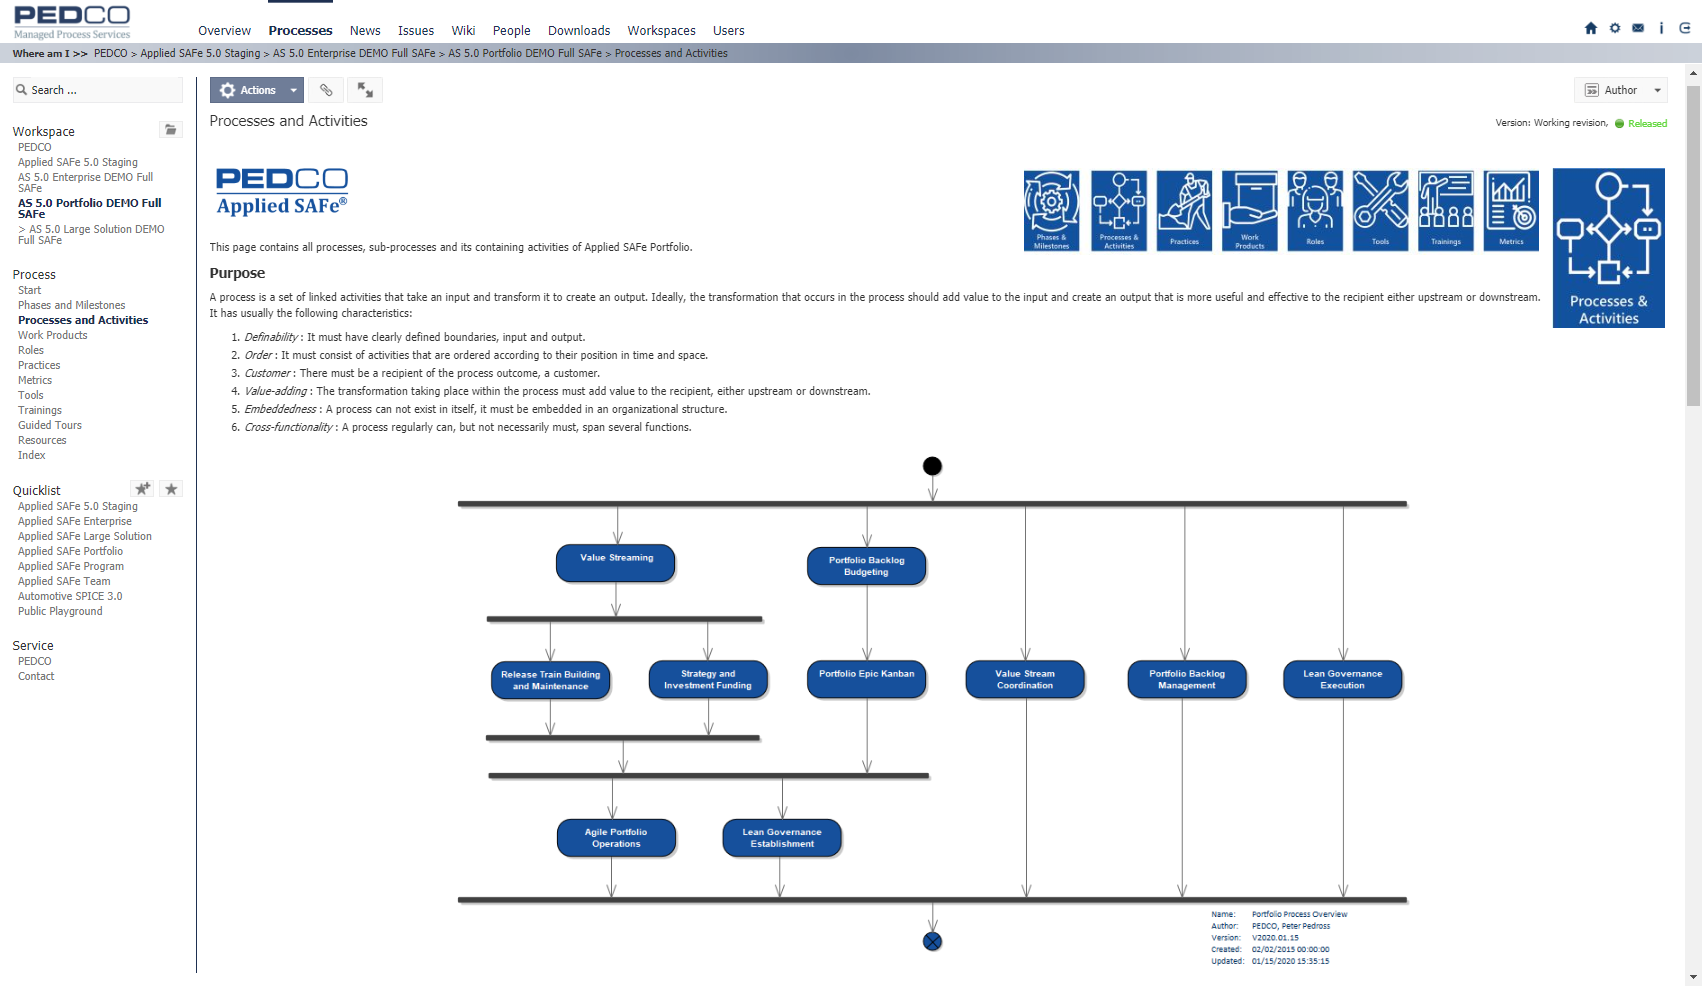 Portfolio Processes and Activities